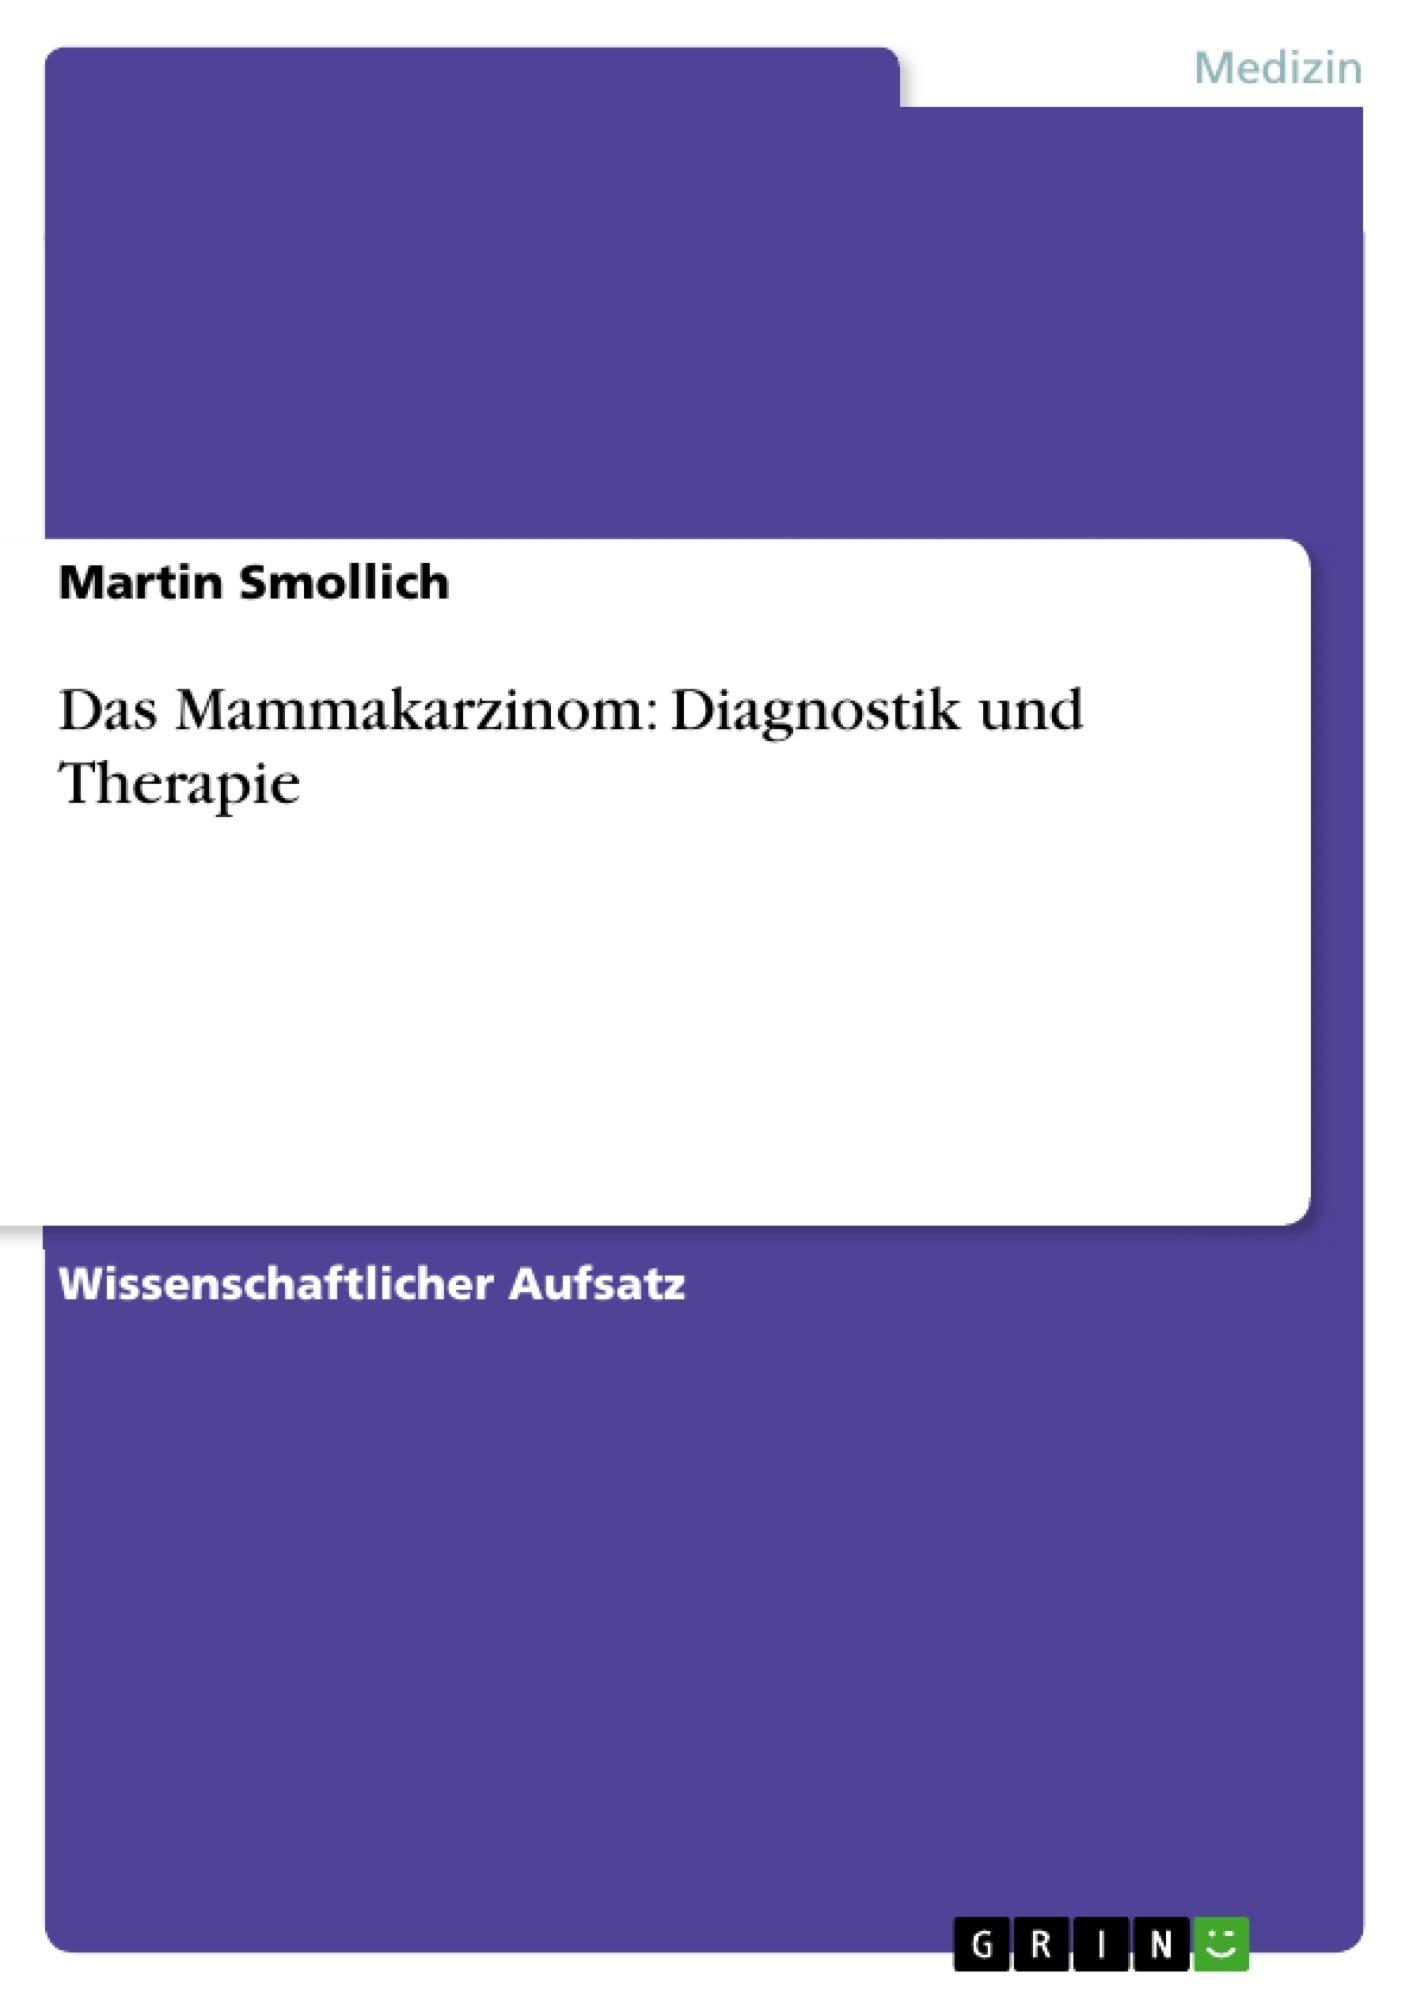 Titel: Das Mammakarzinom: Diagnostik und Therapie